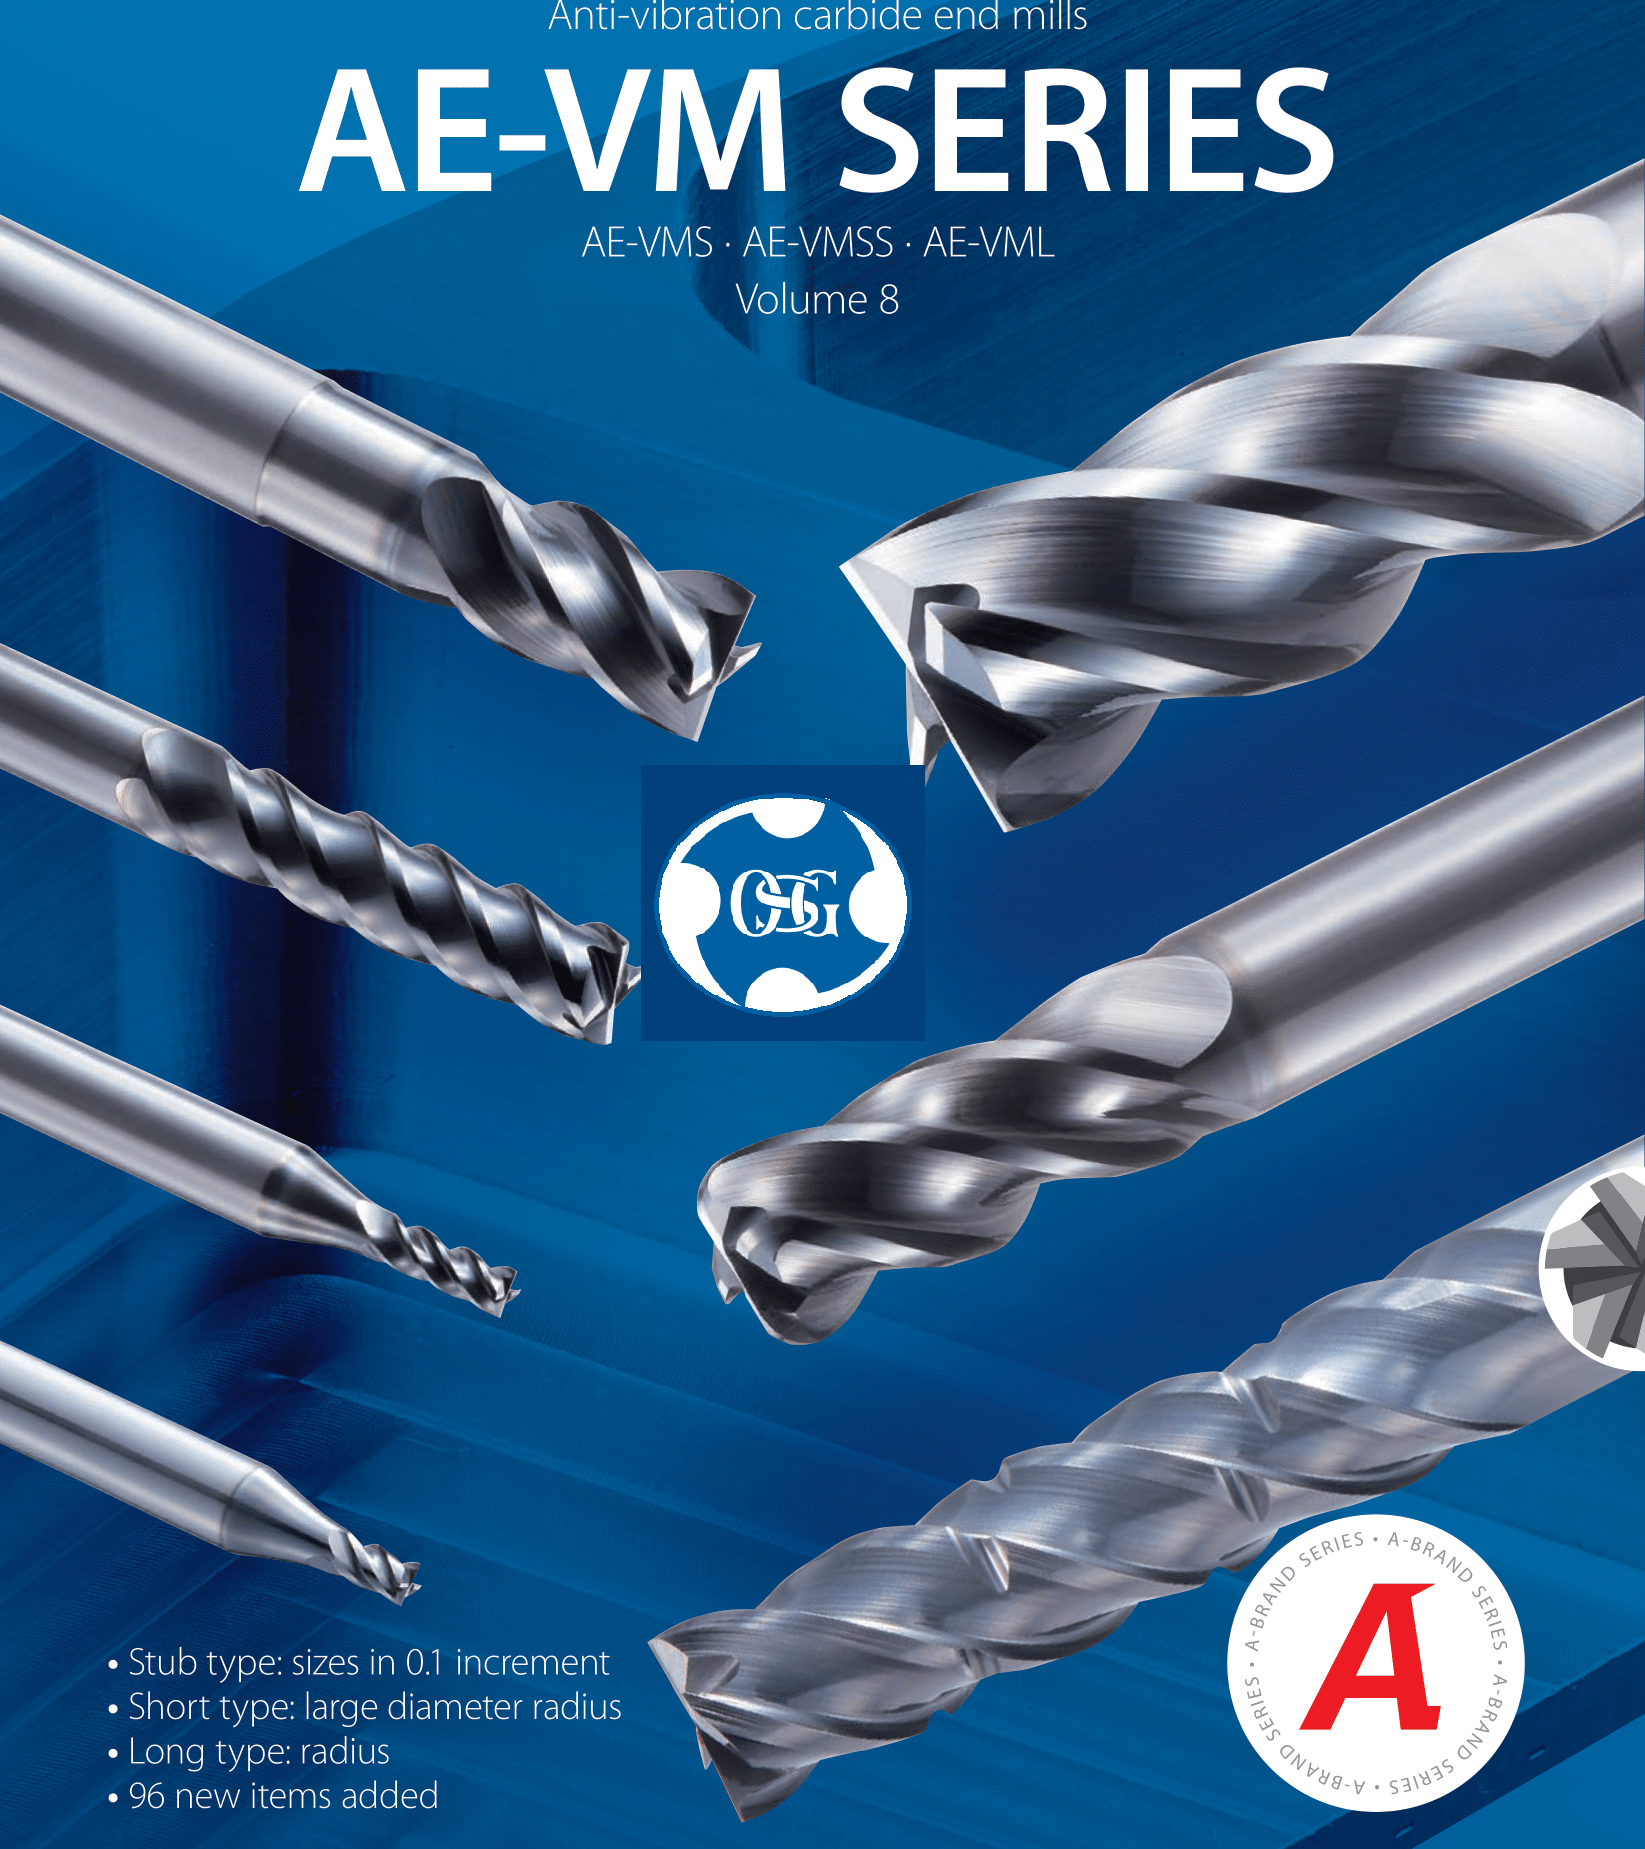 Leaflet_AE_VMS_VOL8_EU_EN_web-1.png